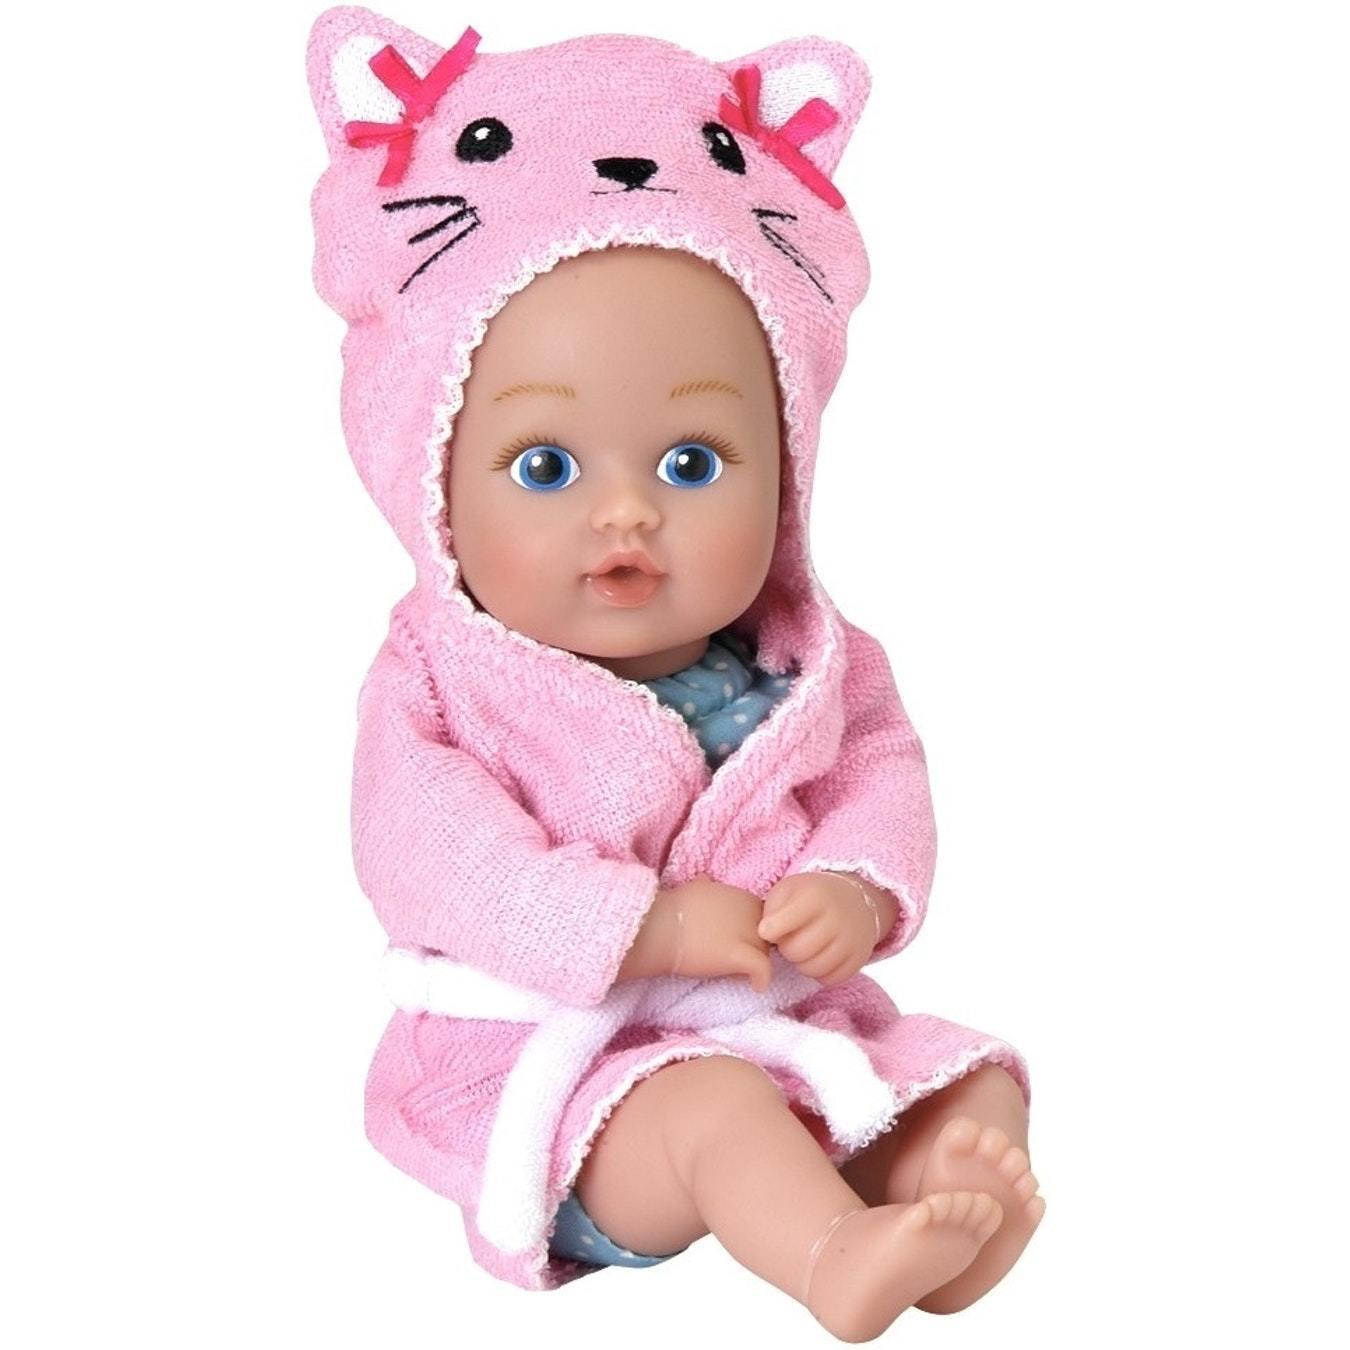 Adora: Bathtime Baby Doll - Kitty image